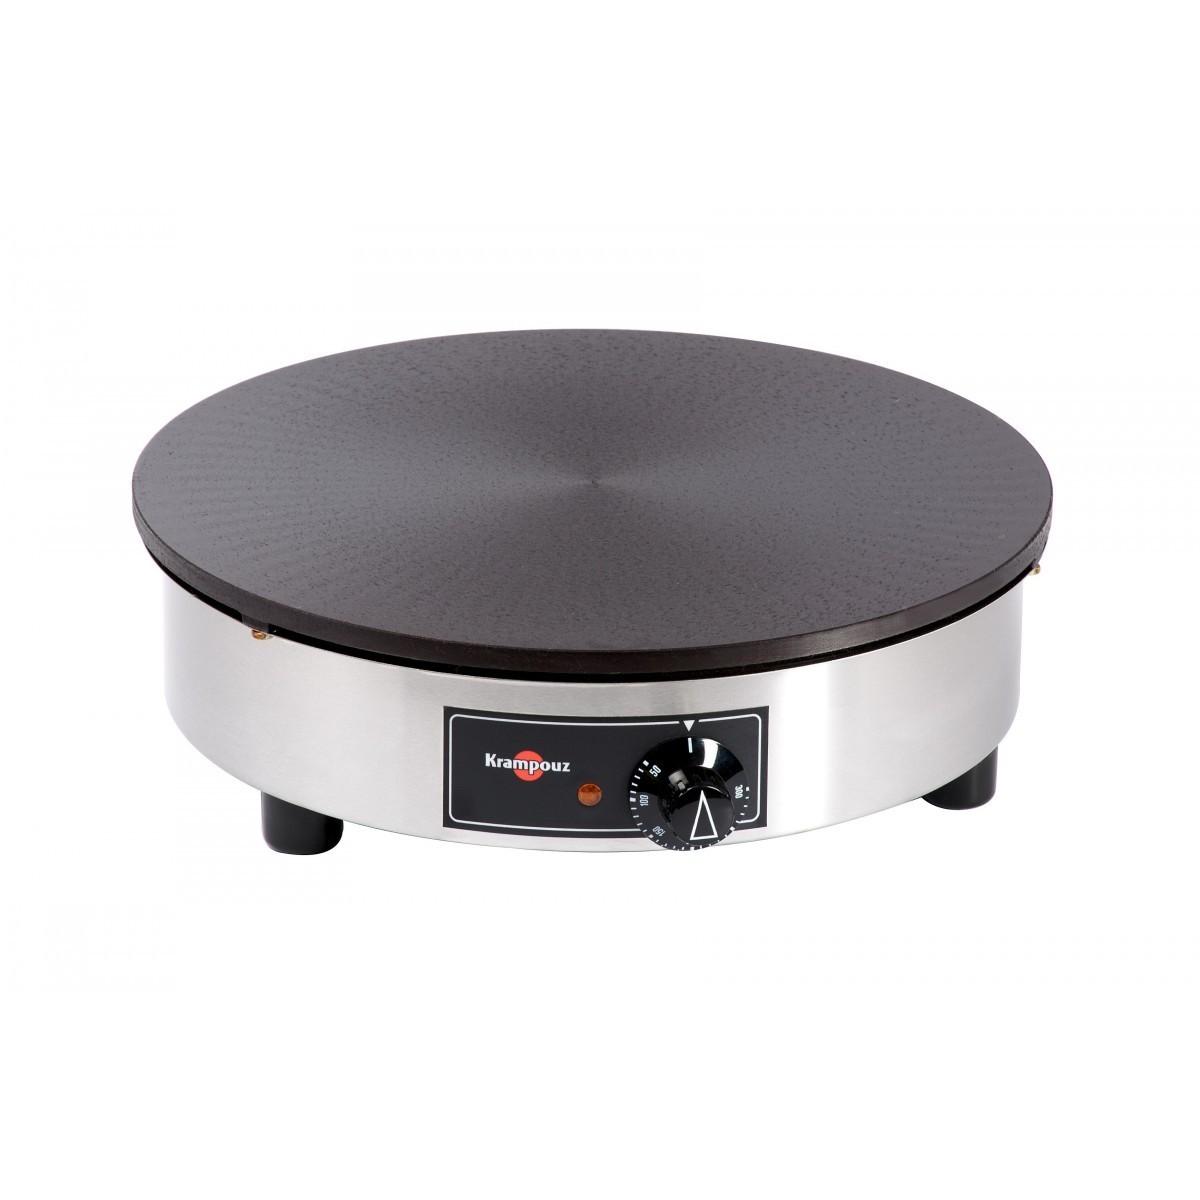 Krampouz - Electric Crepe Makers, Profesional Range, Circular Griddle, Ø40 cm